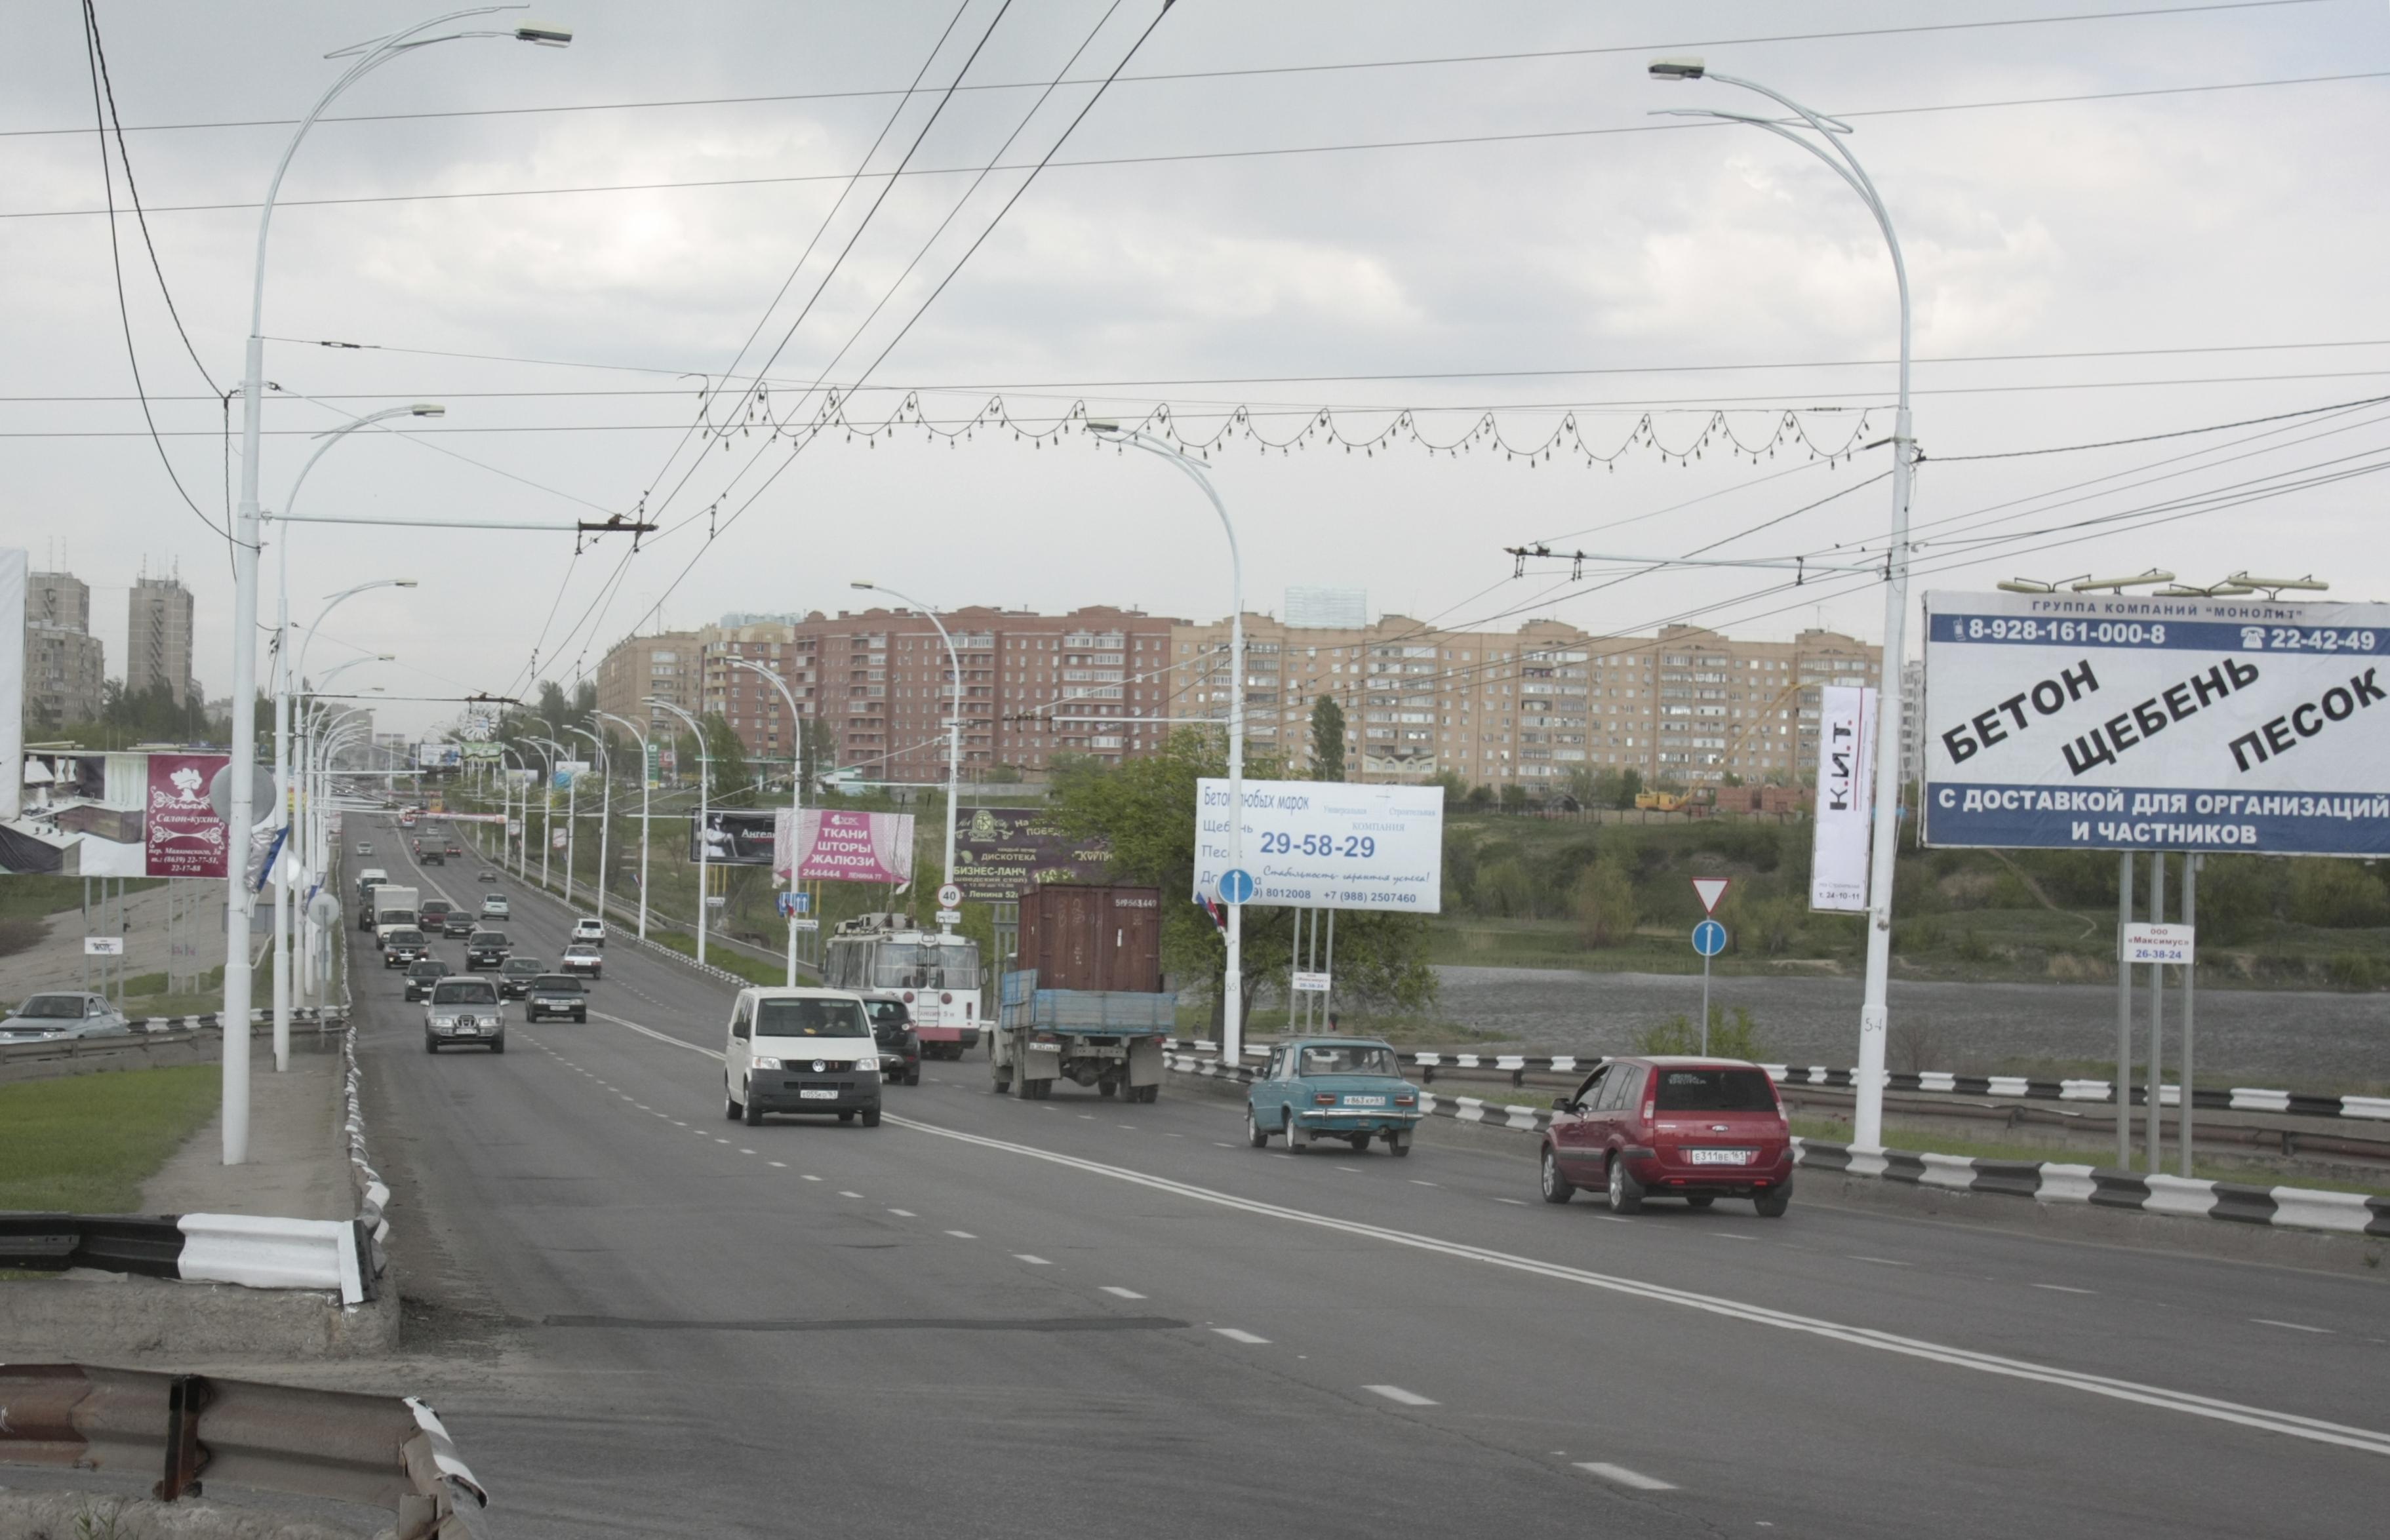 Картинки по запросу волгодонск дорога